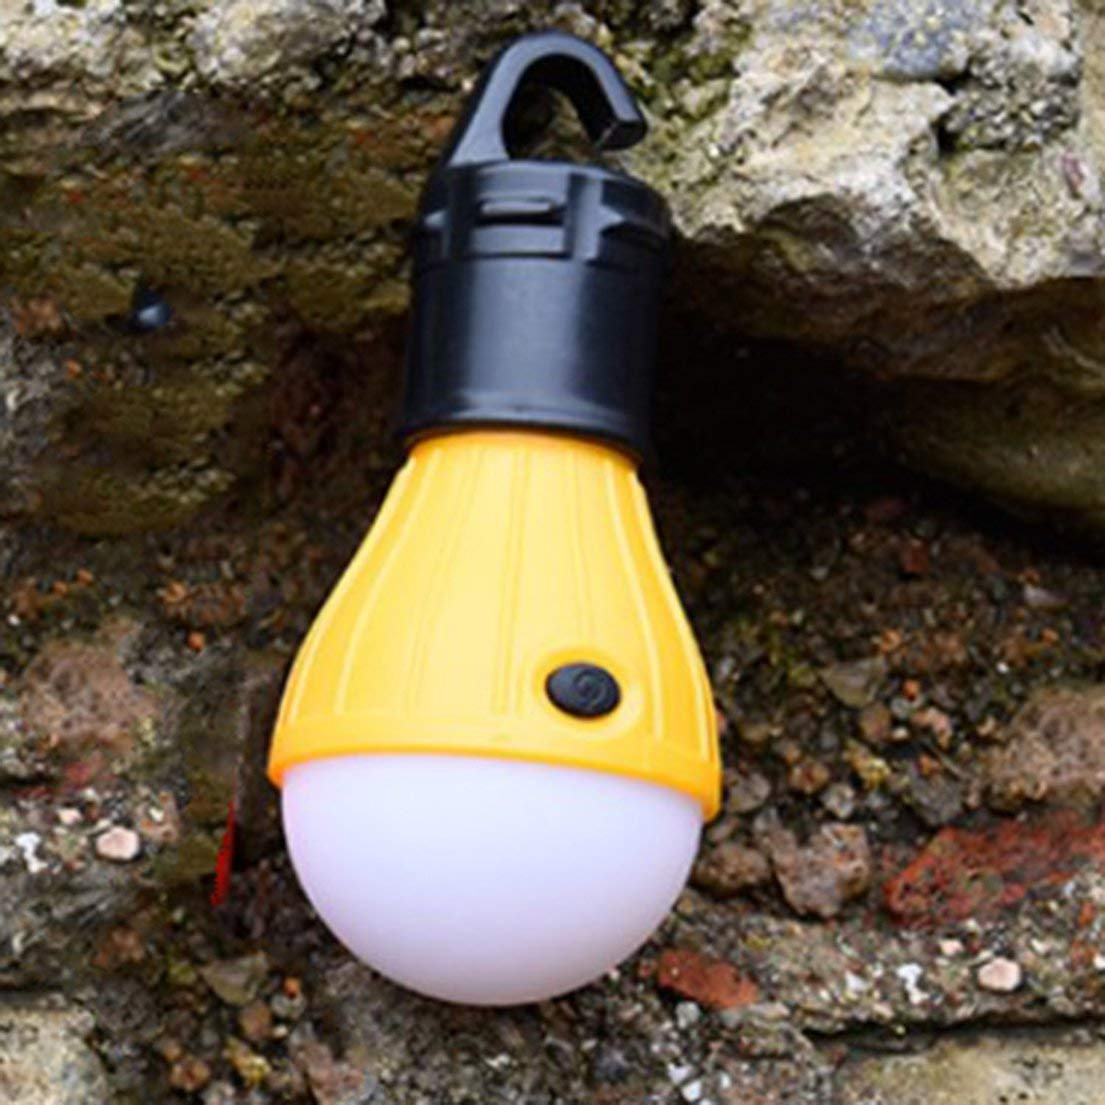 Mini Linterna port/átil Tienda de luz LED Bombilla Impermeable Colgante Gancho Linterna para Acampar DFHJSXD